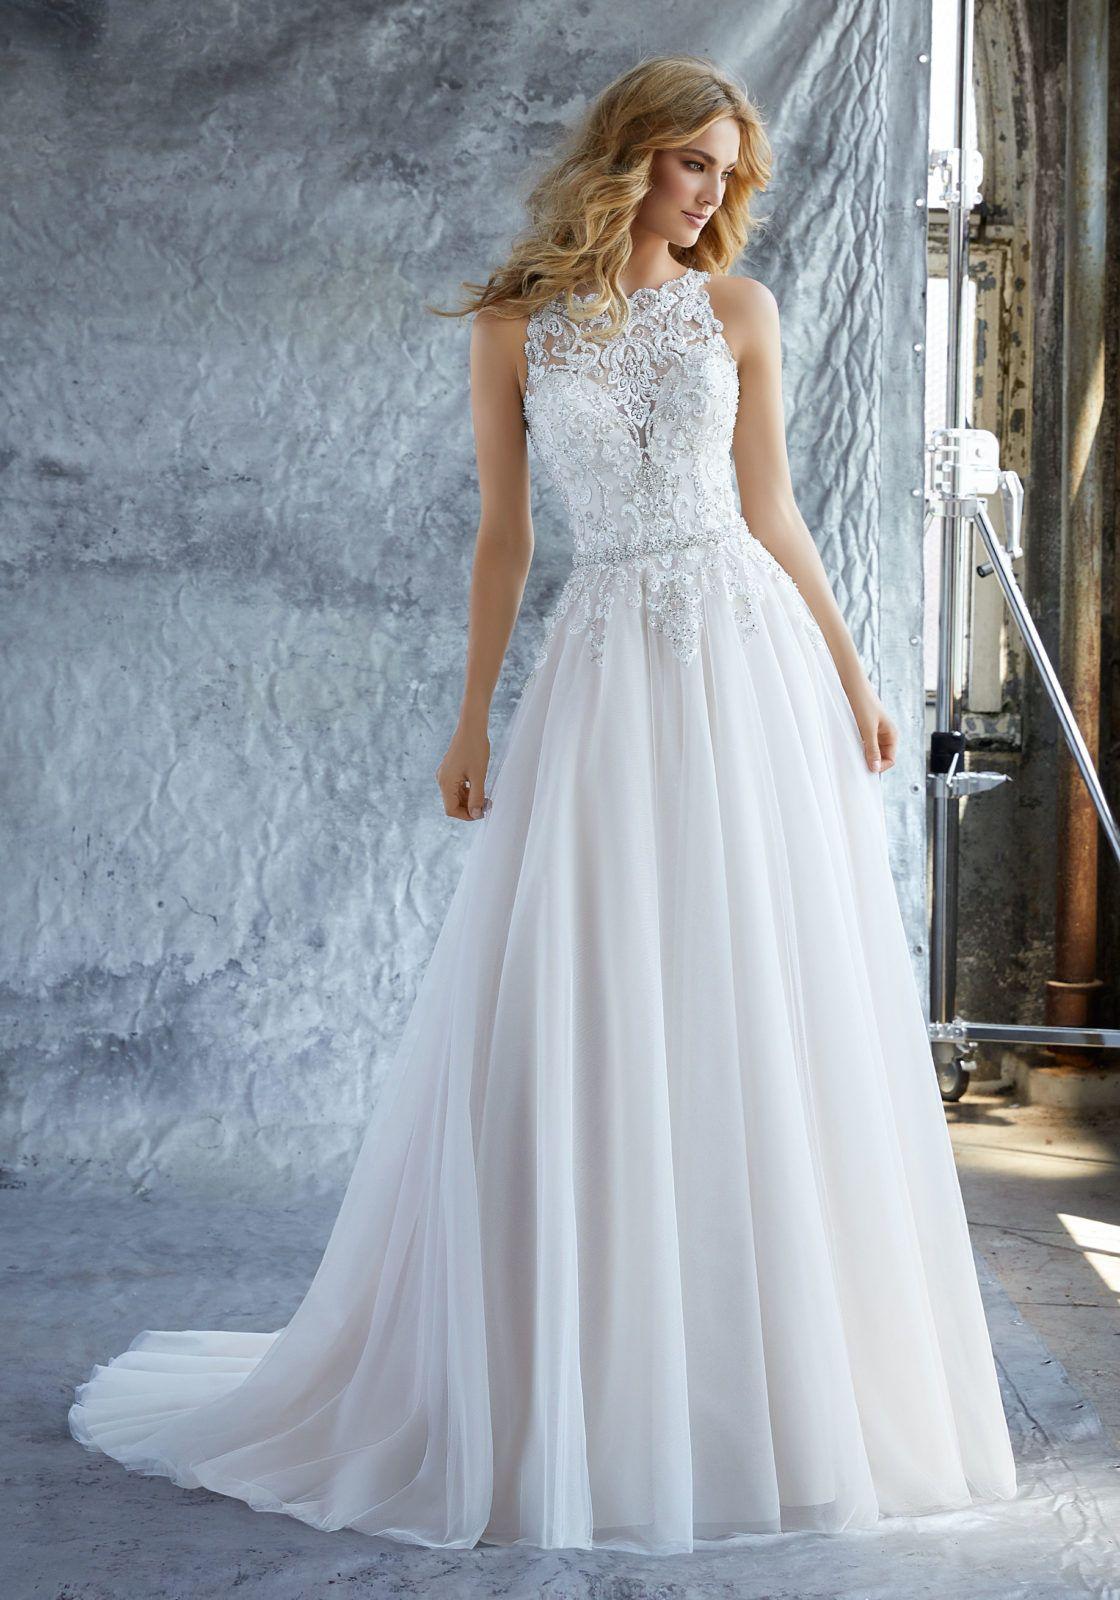 Katie Wedding Dress | Clothes | Pinterest | Wedding dress, Weddings ...